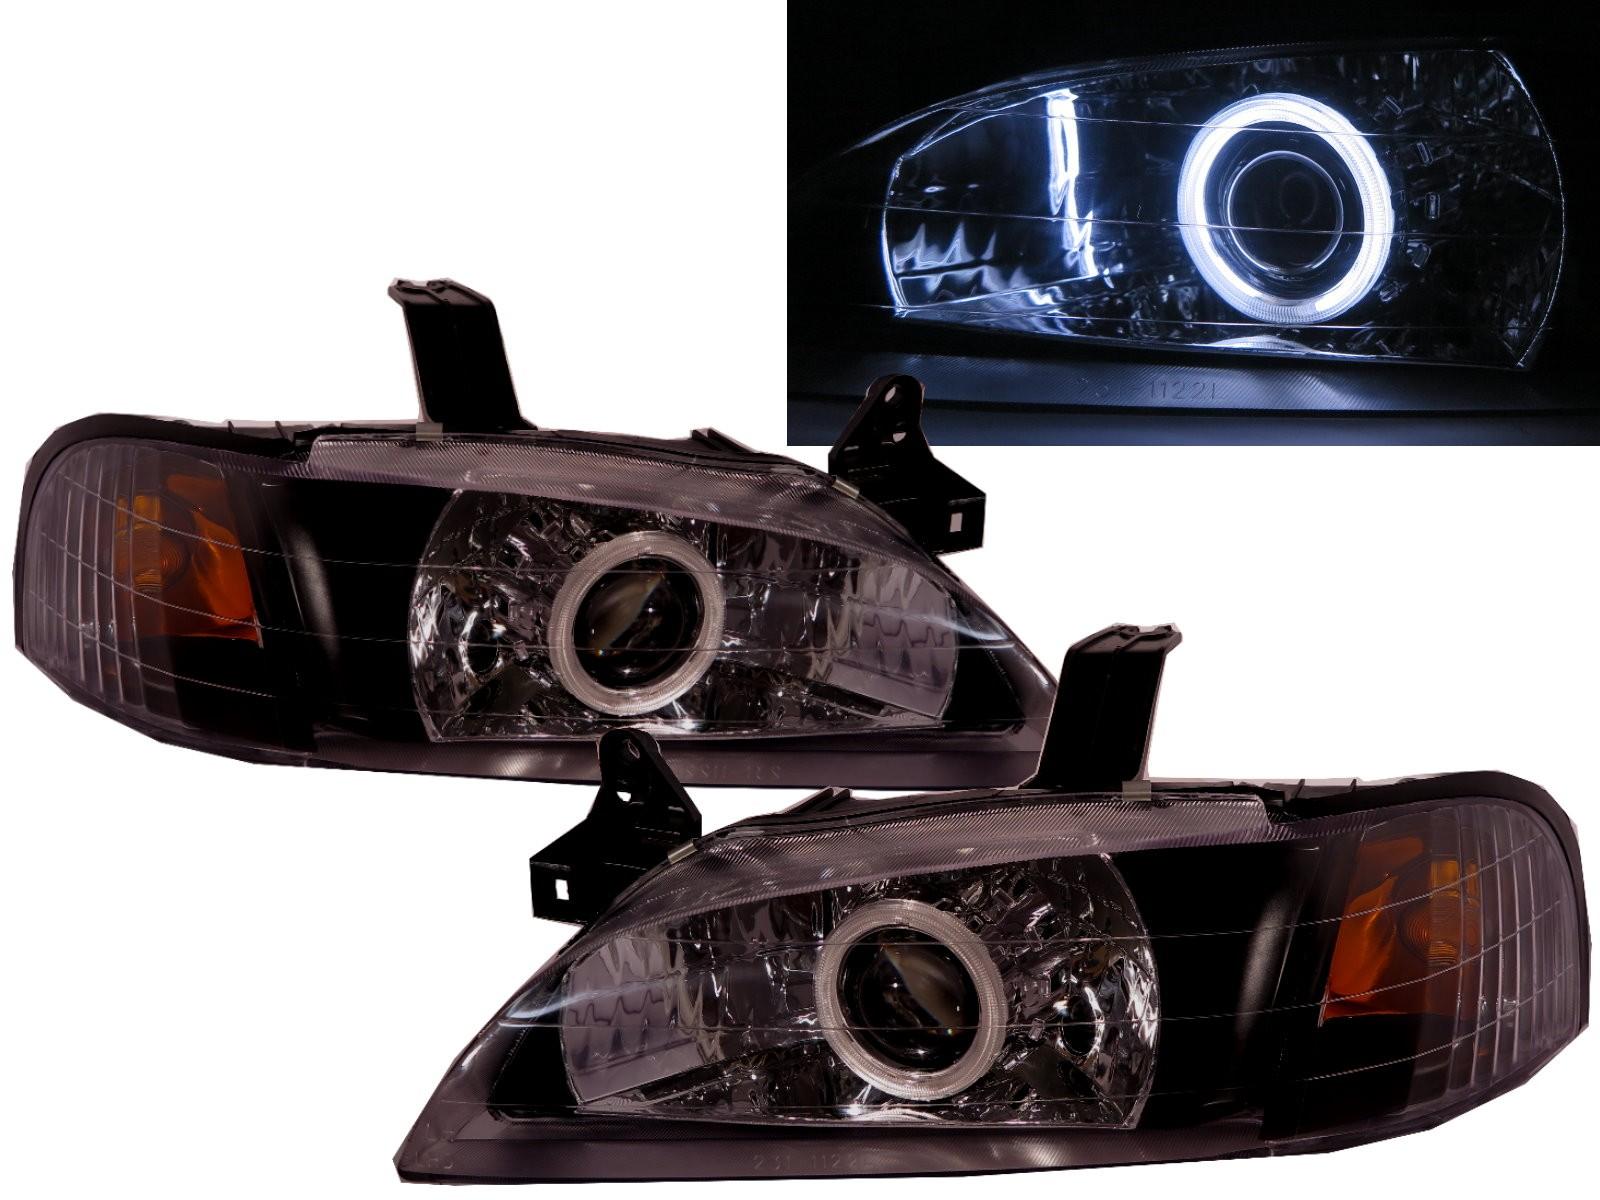 CrazyTheGod LASER KJ/KL 1994-1999 CCFL HID XENON Projector Headlight Headlamp  BLACK for FORD RHD